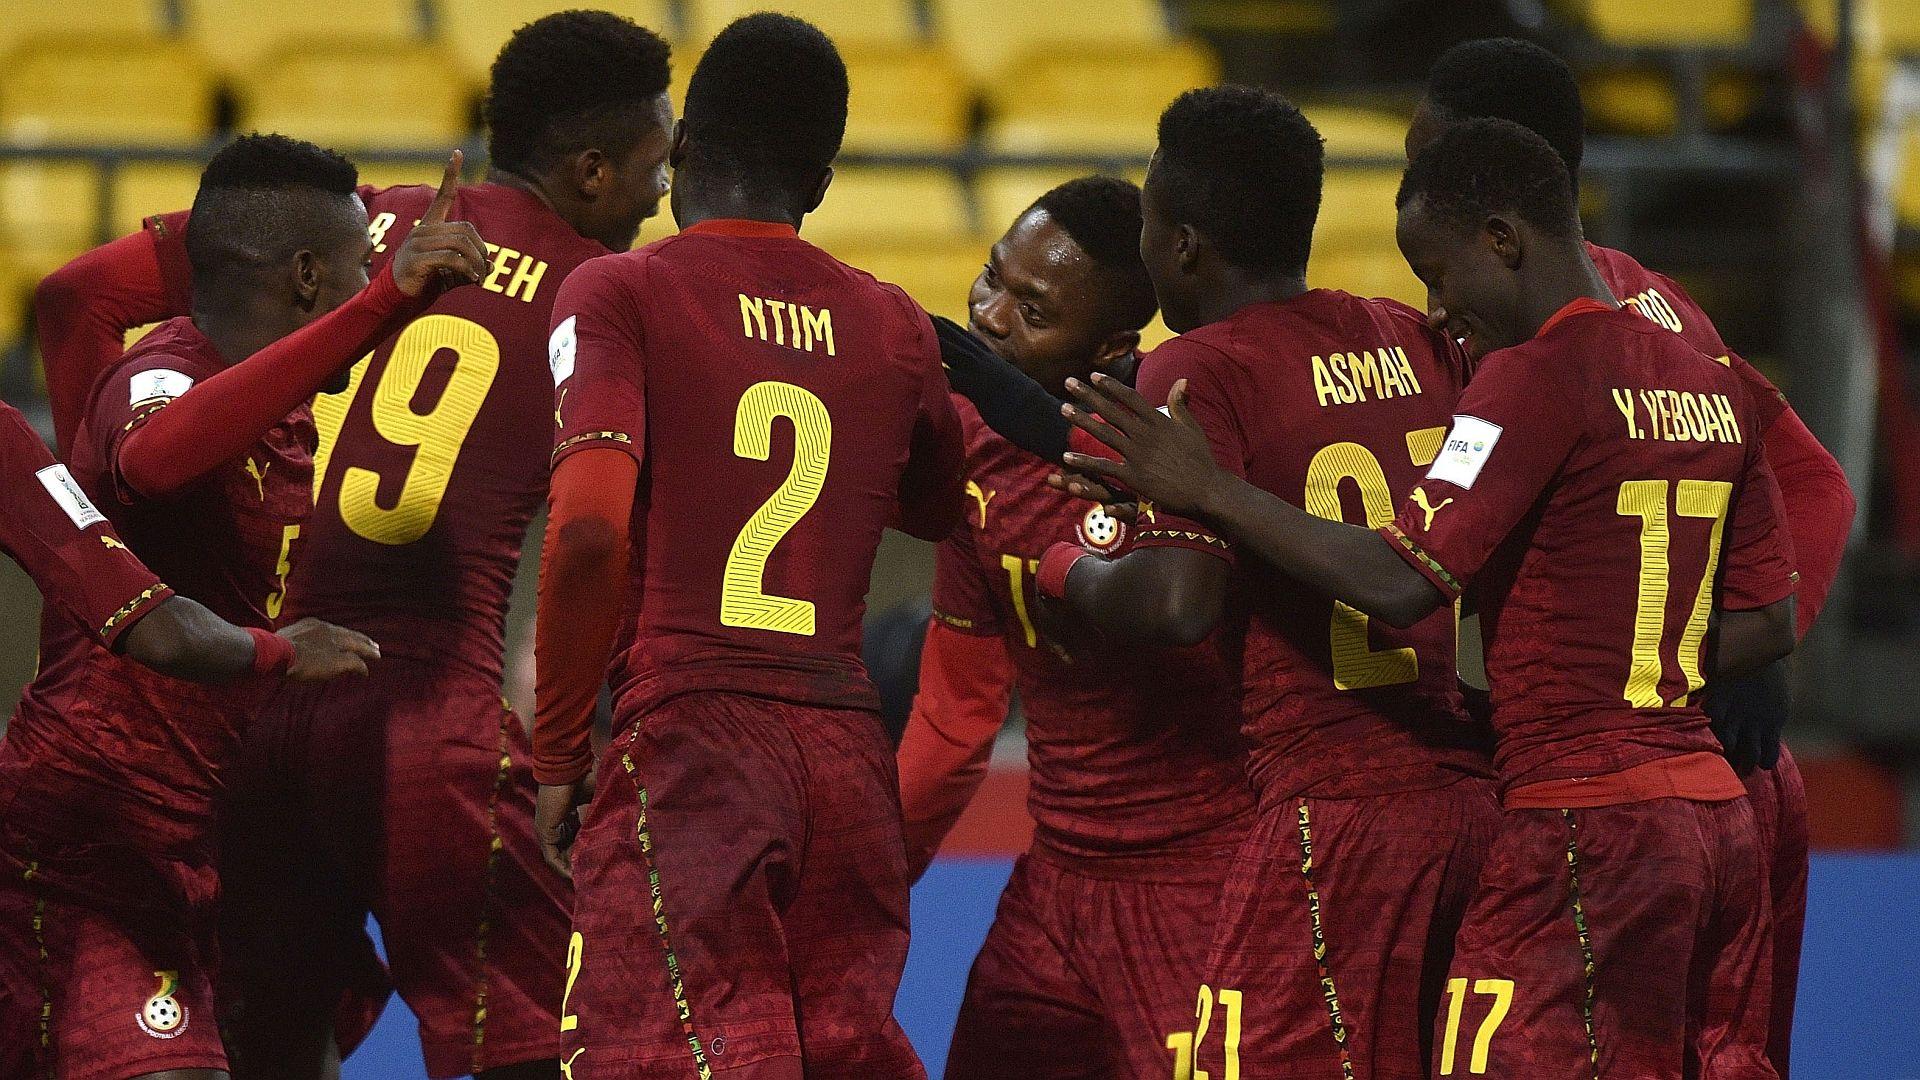 African Games: Ghana 2-1 Burundi - Black Satellites fly high in tournament opener